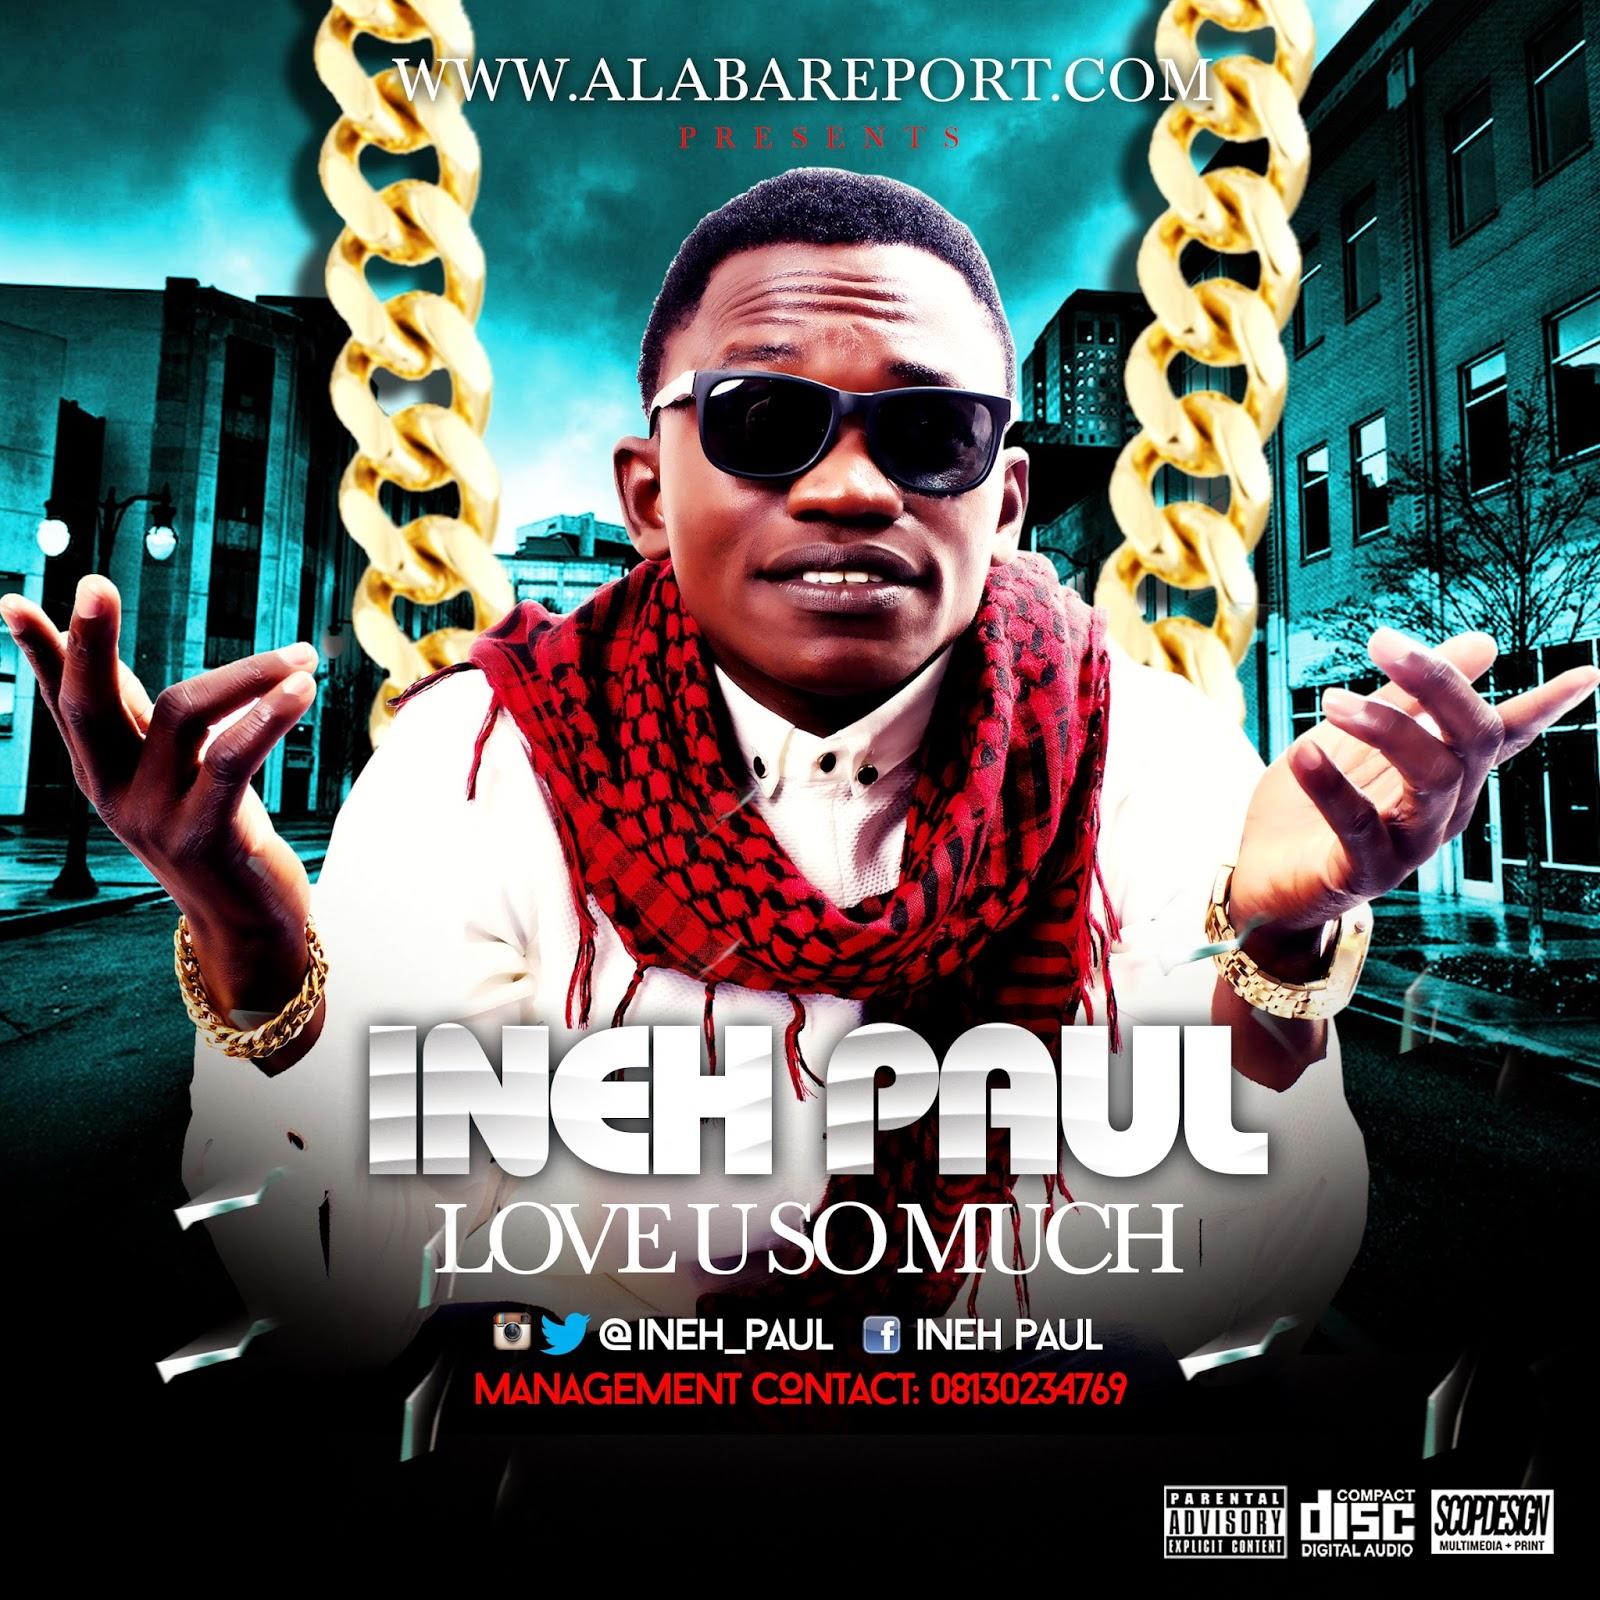 Www Naijapals Com Music Love_u_so_much___ineh_paul 39385